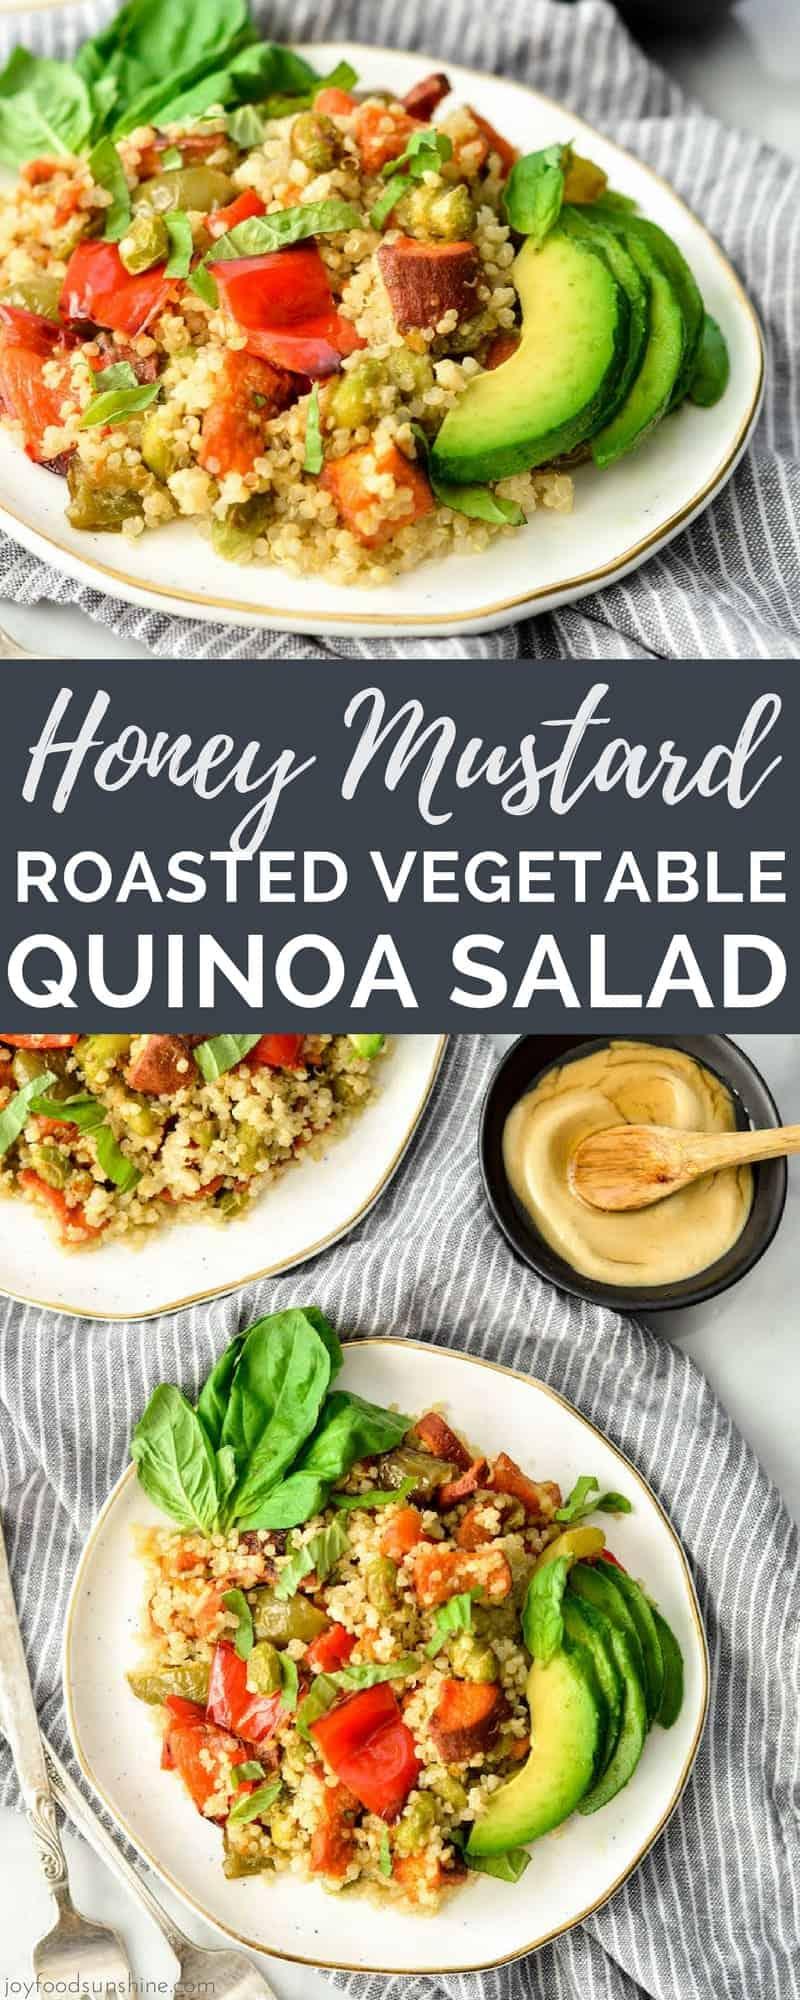 Honey Mustard Roasted Vegetable Quinoa Salad - JoyFoodSunshine